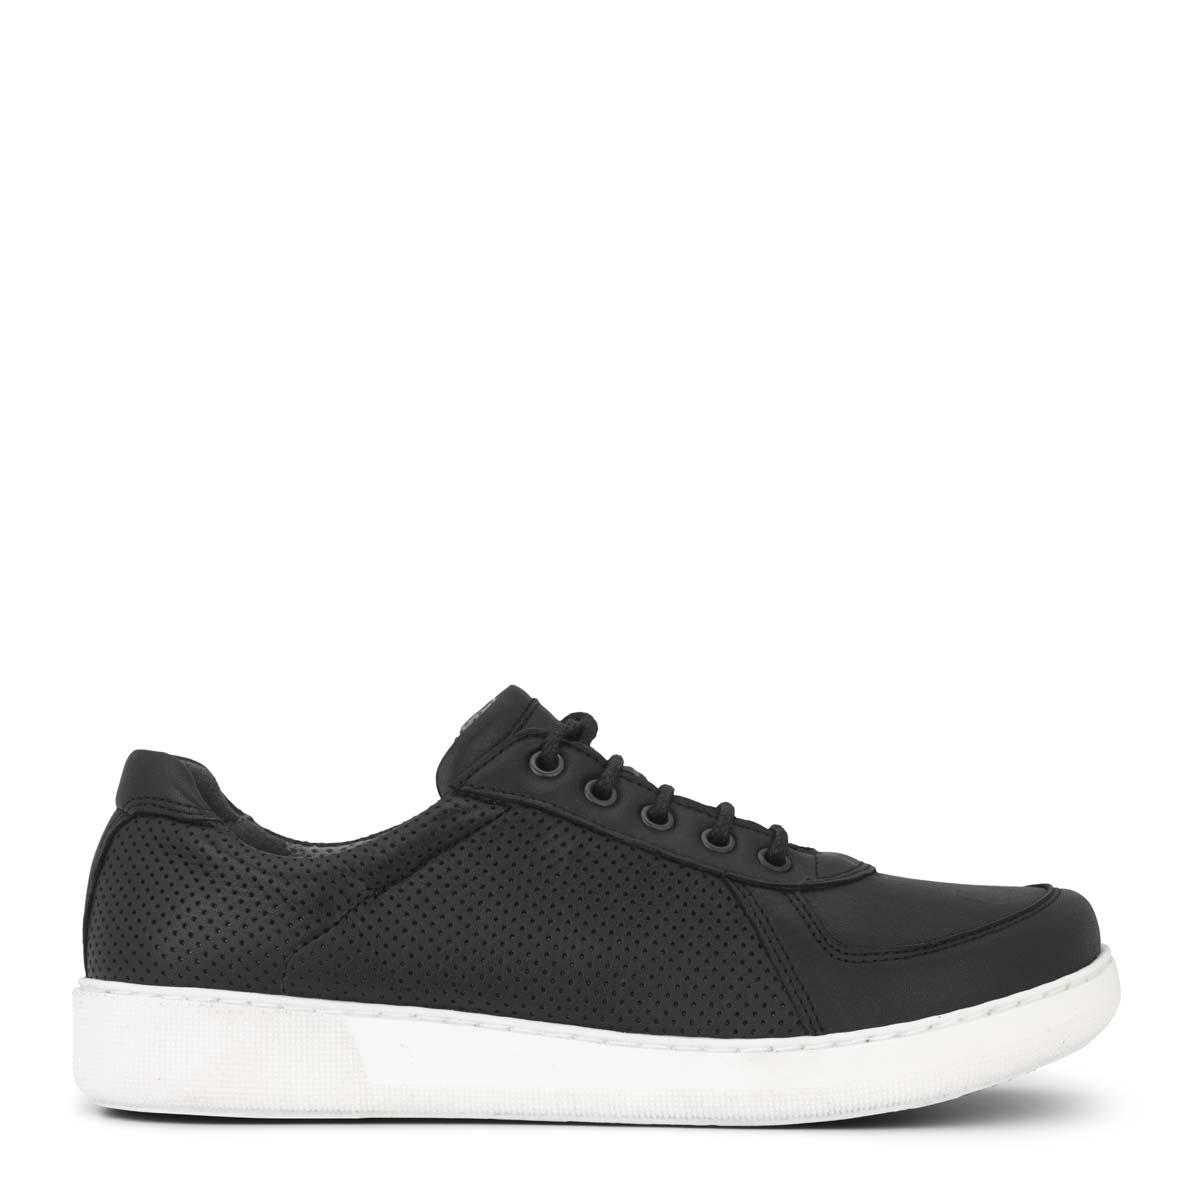 New Feet damesko i sort læder – ekstra bred fra